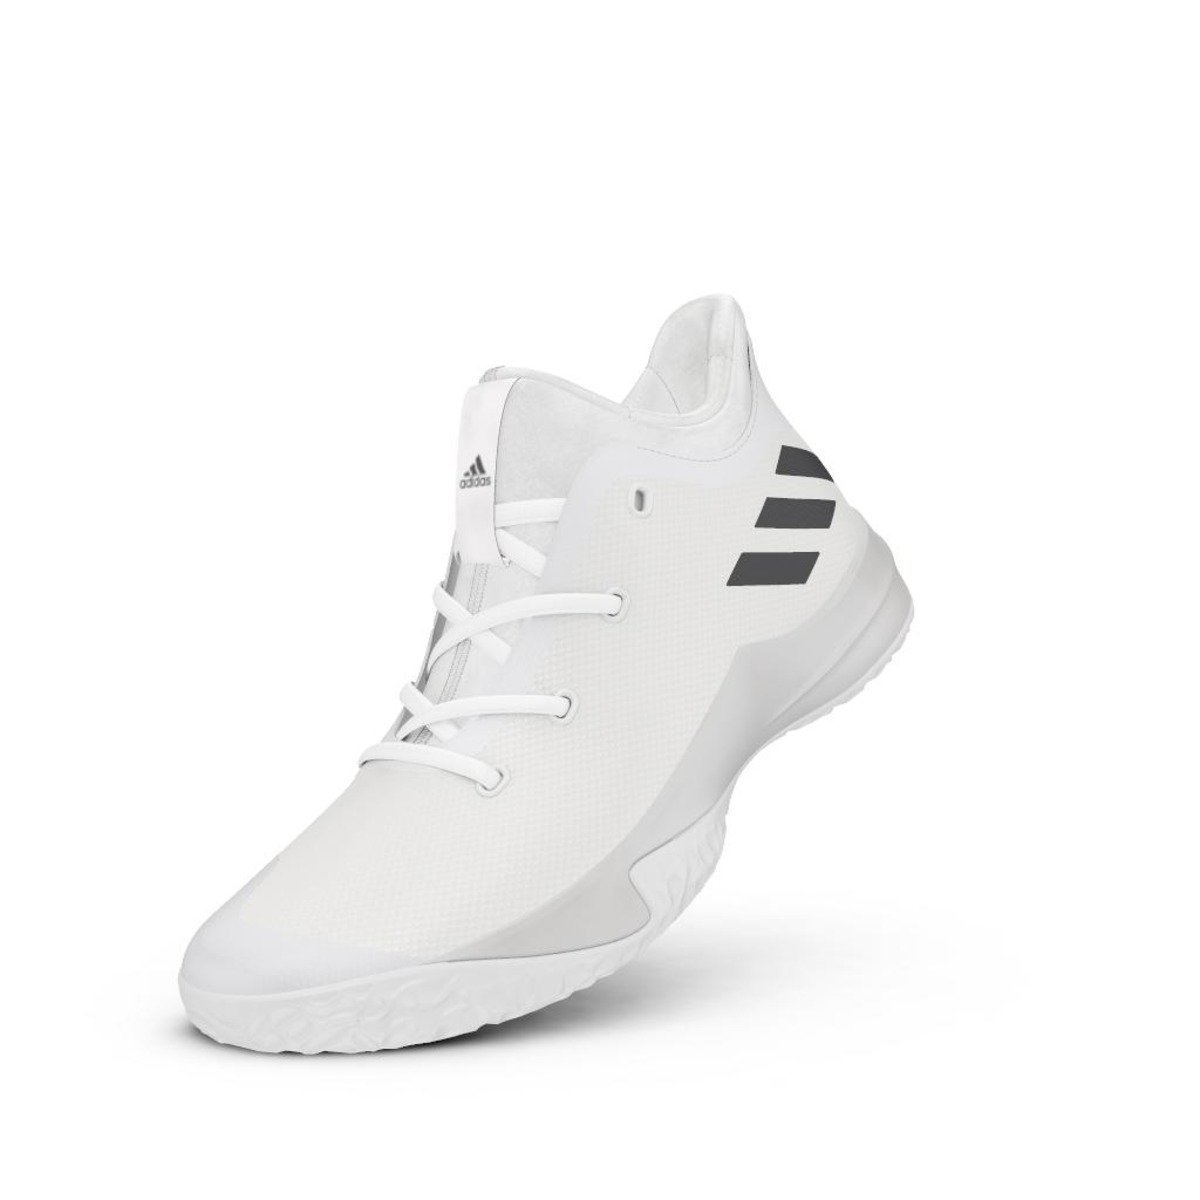 33777bba3deb ... Adidas Rise Up 2 Shoes- CQ0560 ...